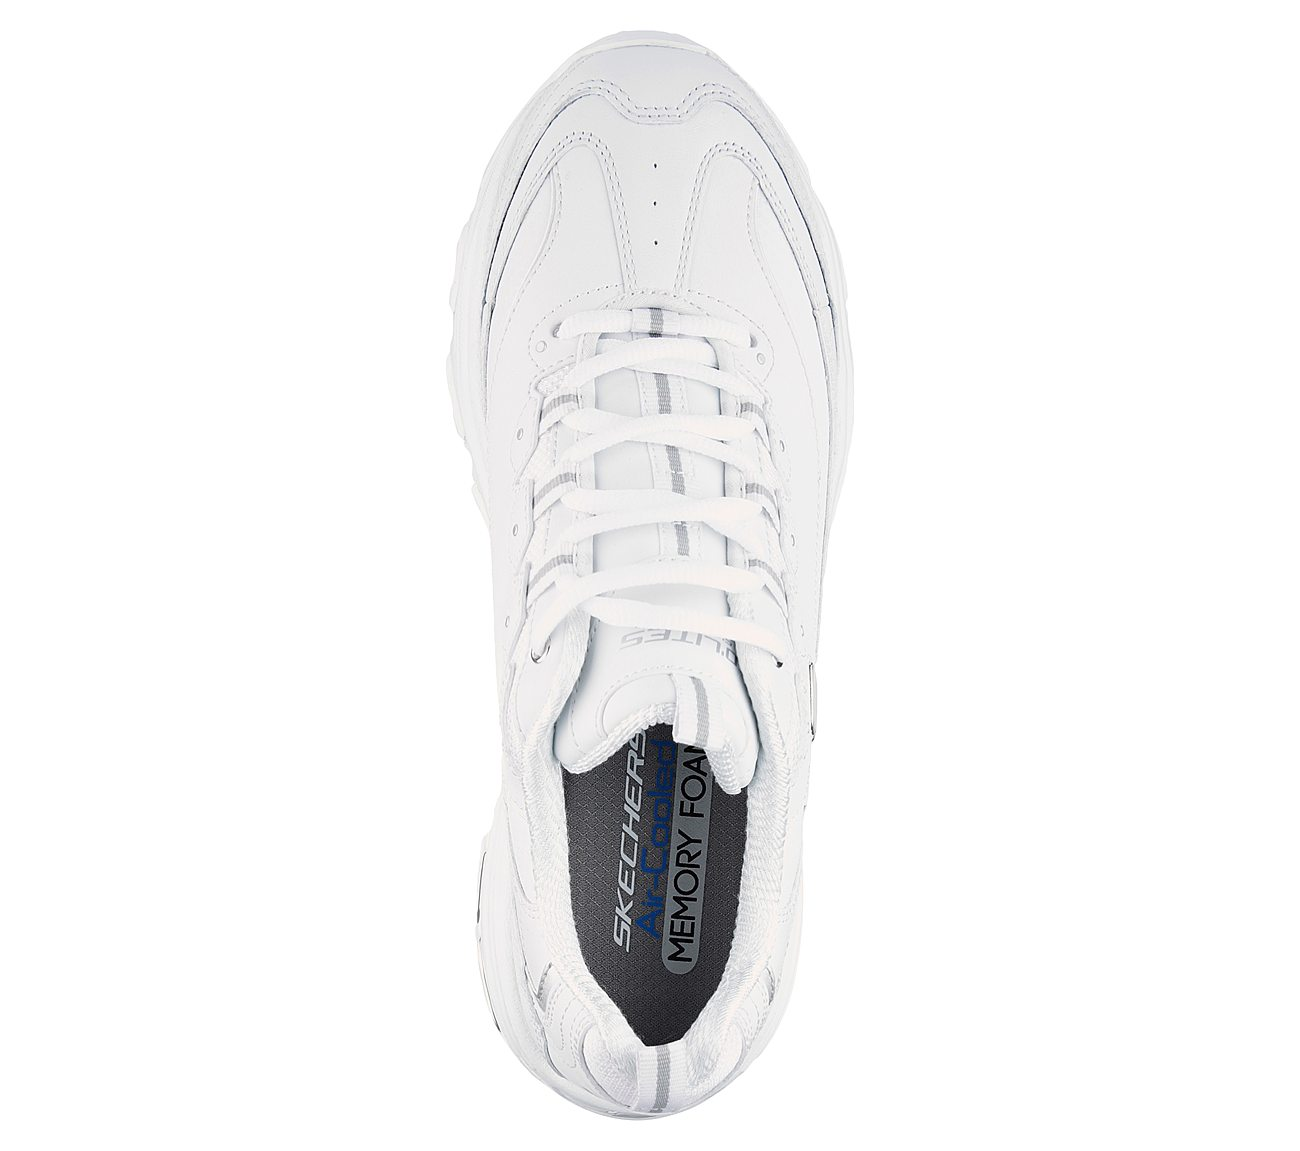 055542a6 Buy SKECHERS D'Lites - Buffston D'Lites Shoes only $70.00